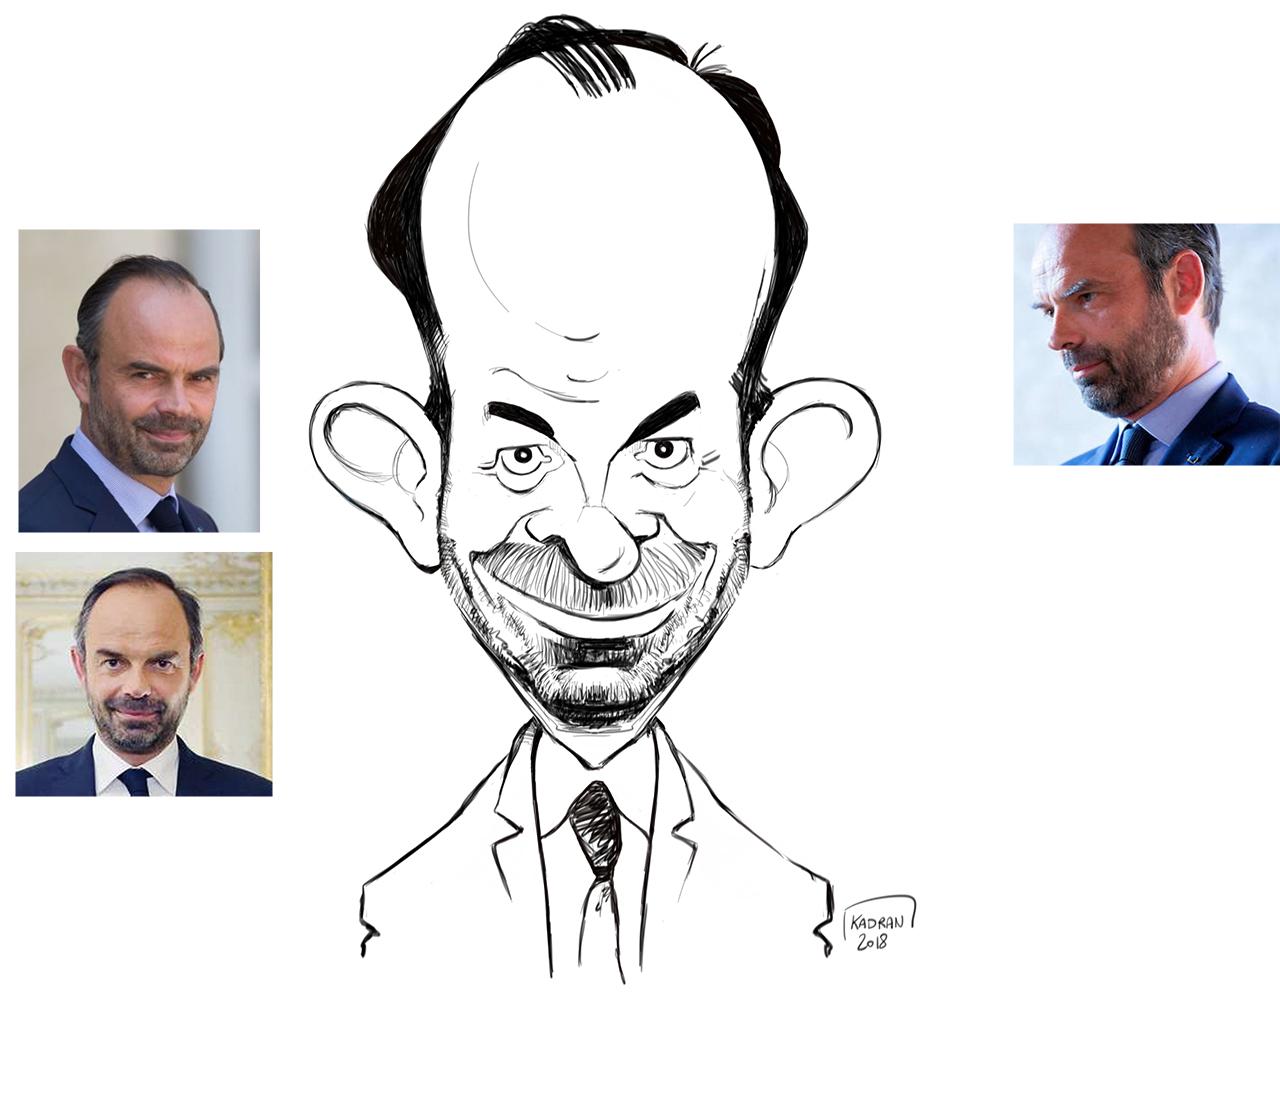 Édouard Philippe caricature sketch couleur © Kadran 2018 - Kadran-illustrations.com